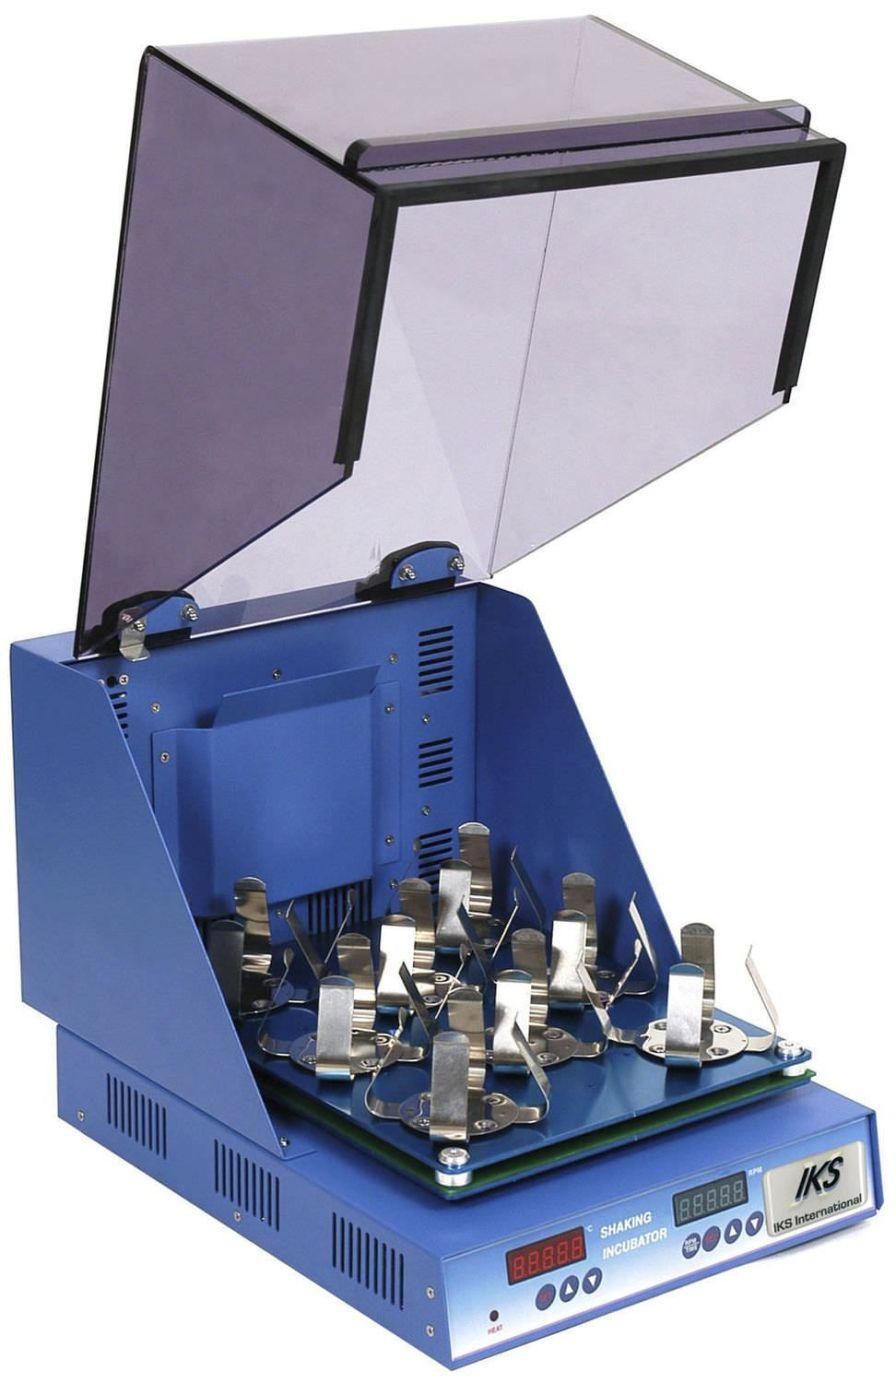 Bench-top laboratory incubator shaker IKS IKS International